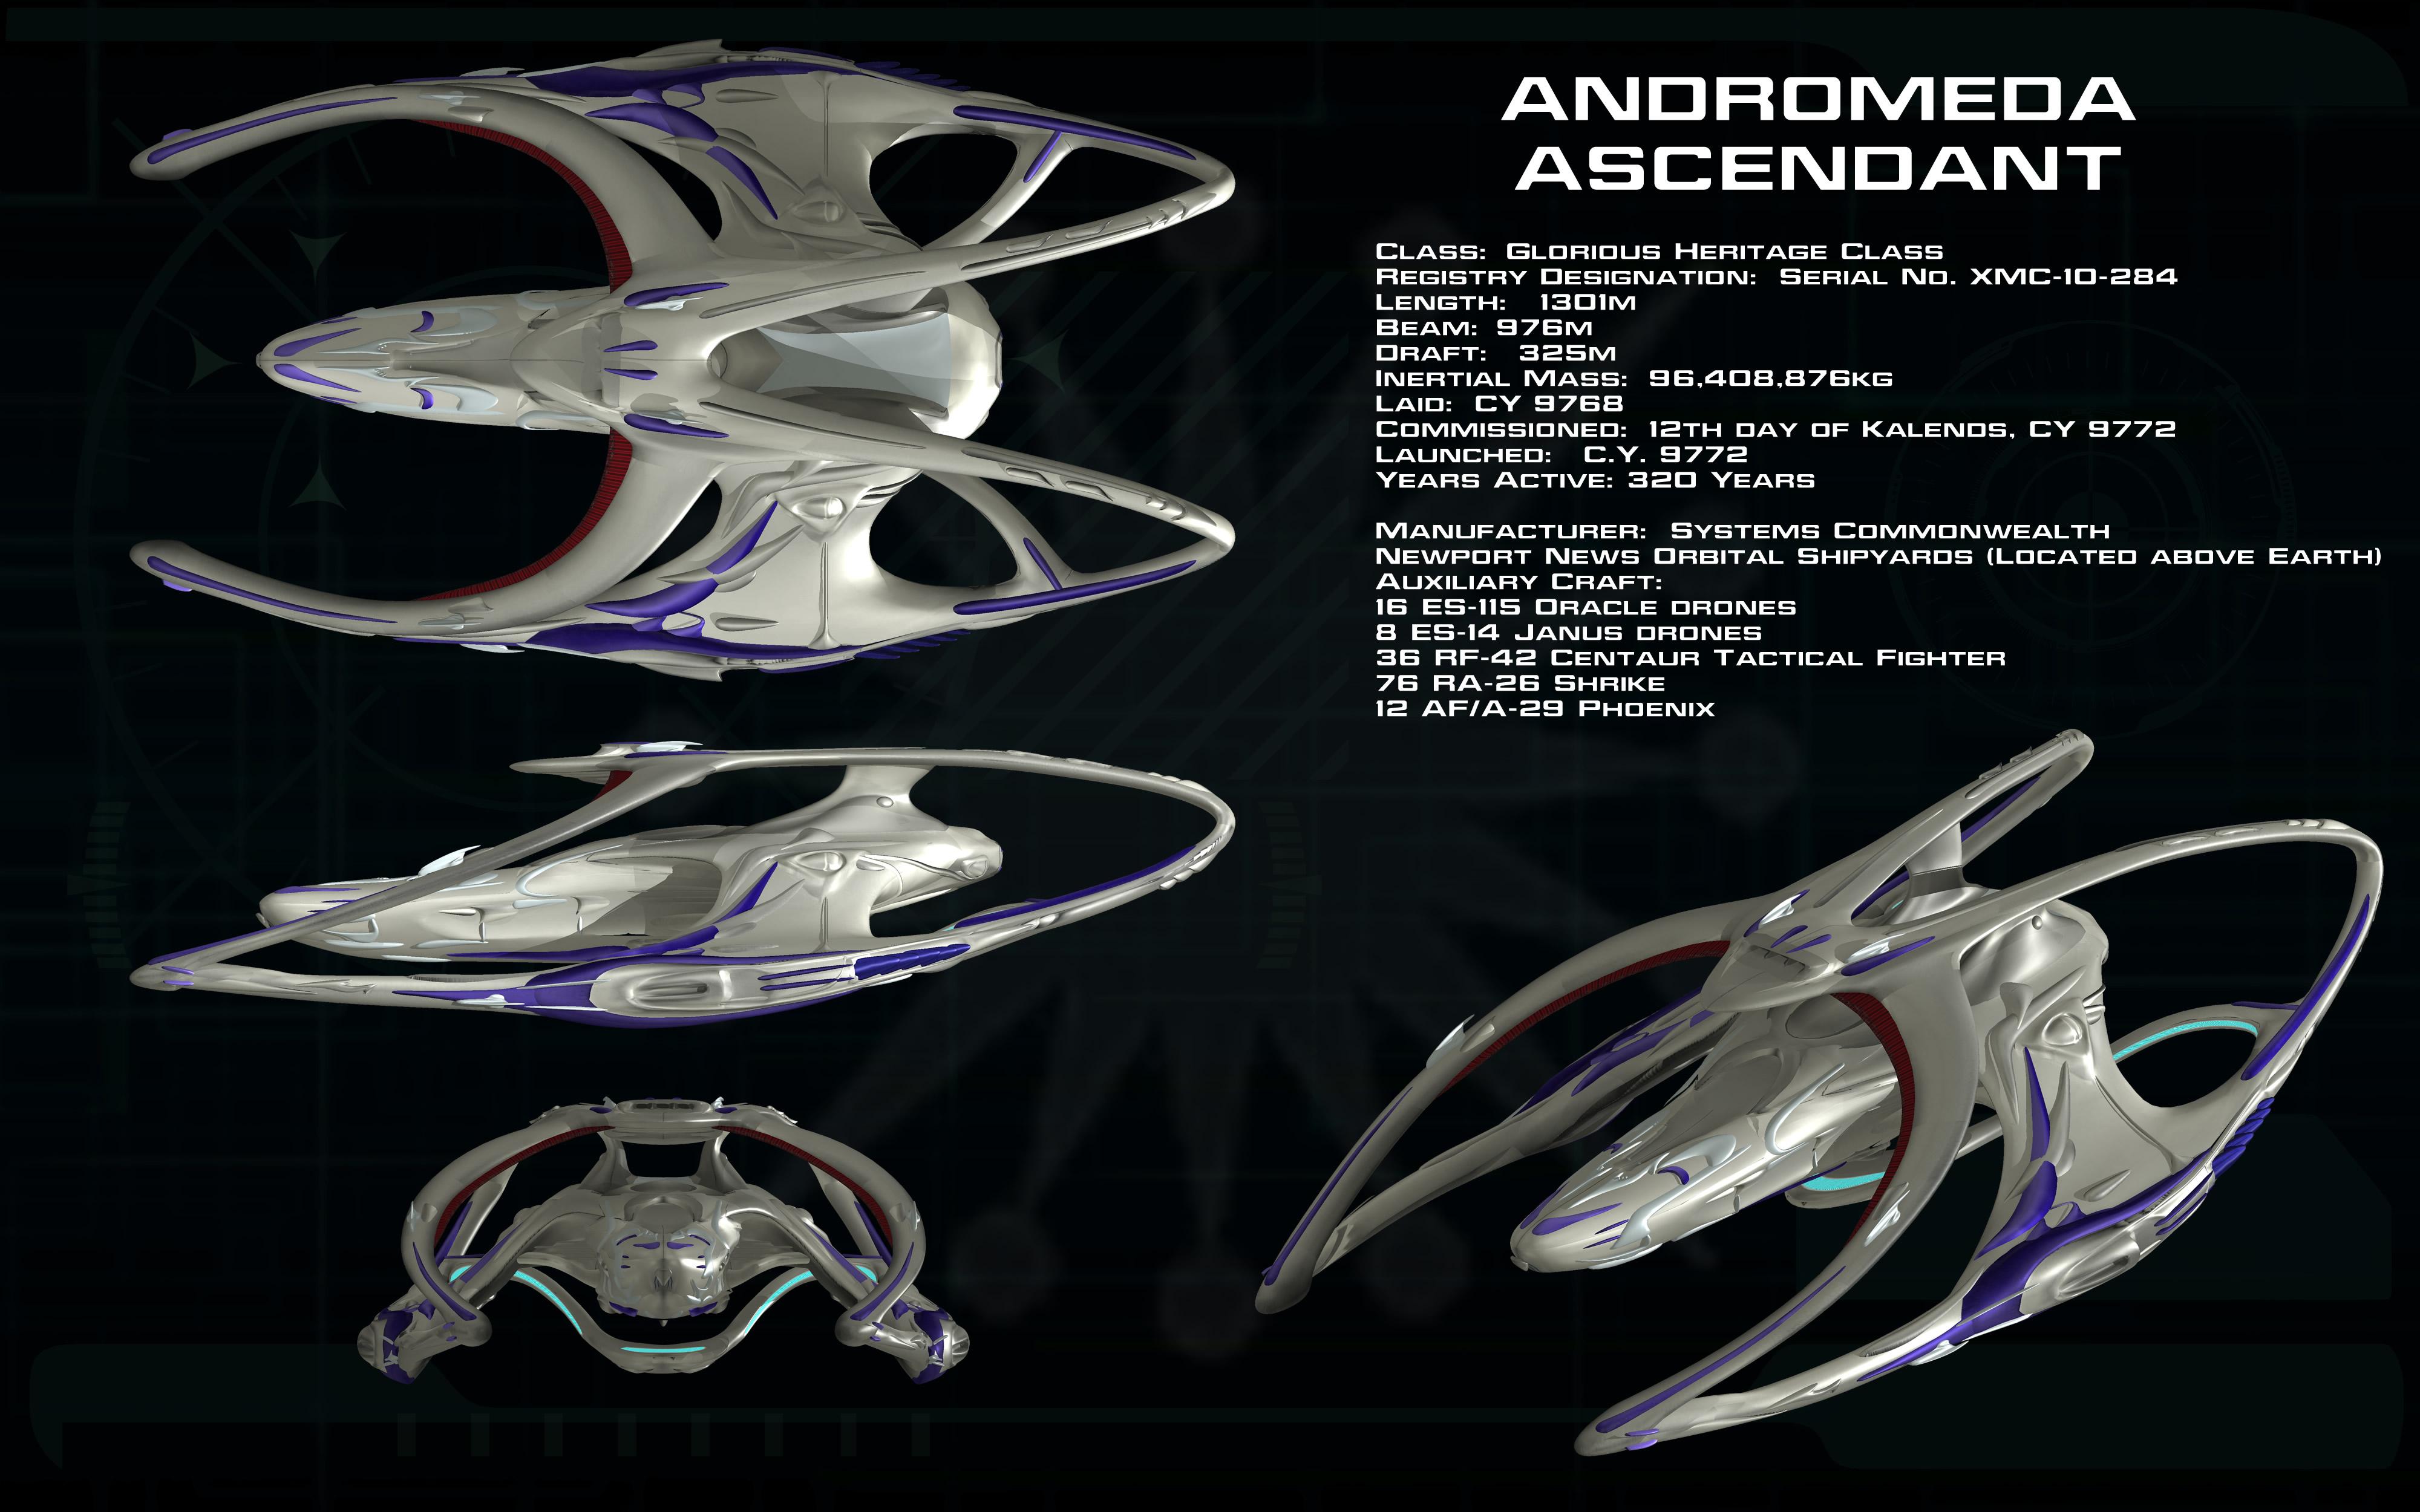 Andromeda Ascendant Ortho By Unusualsuspex On Deviantart